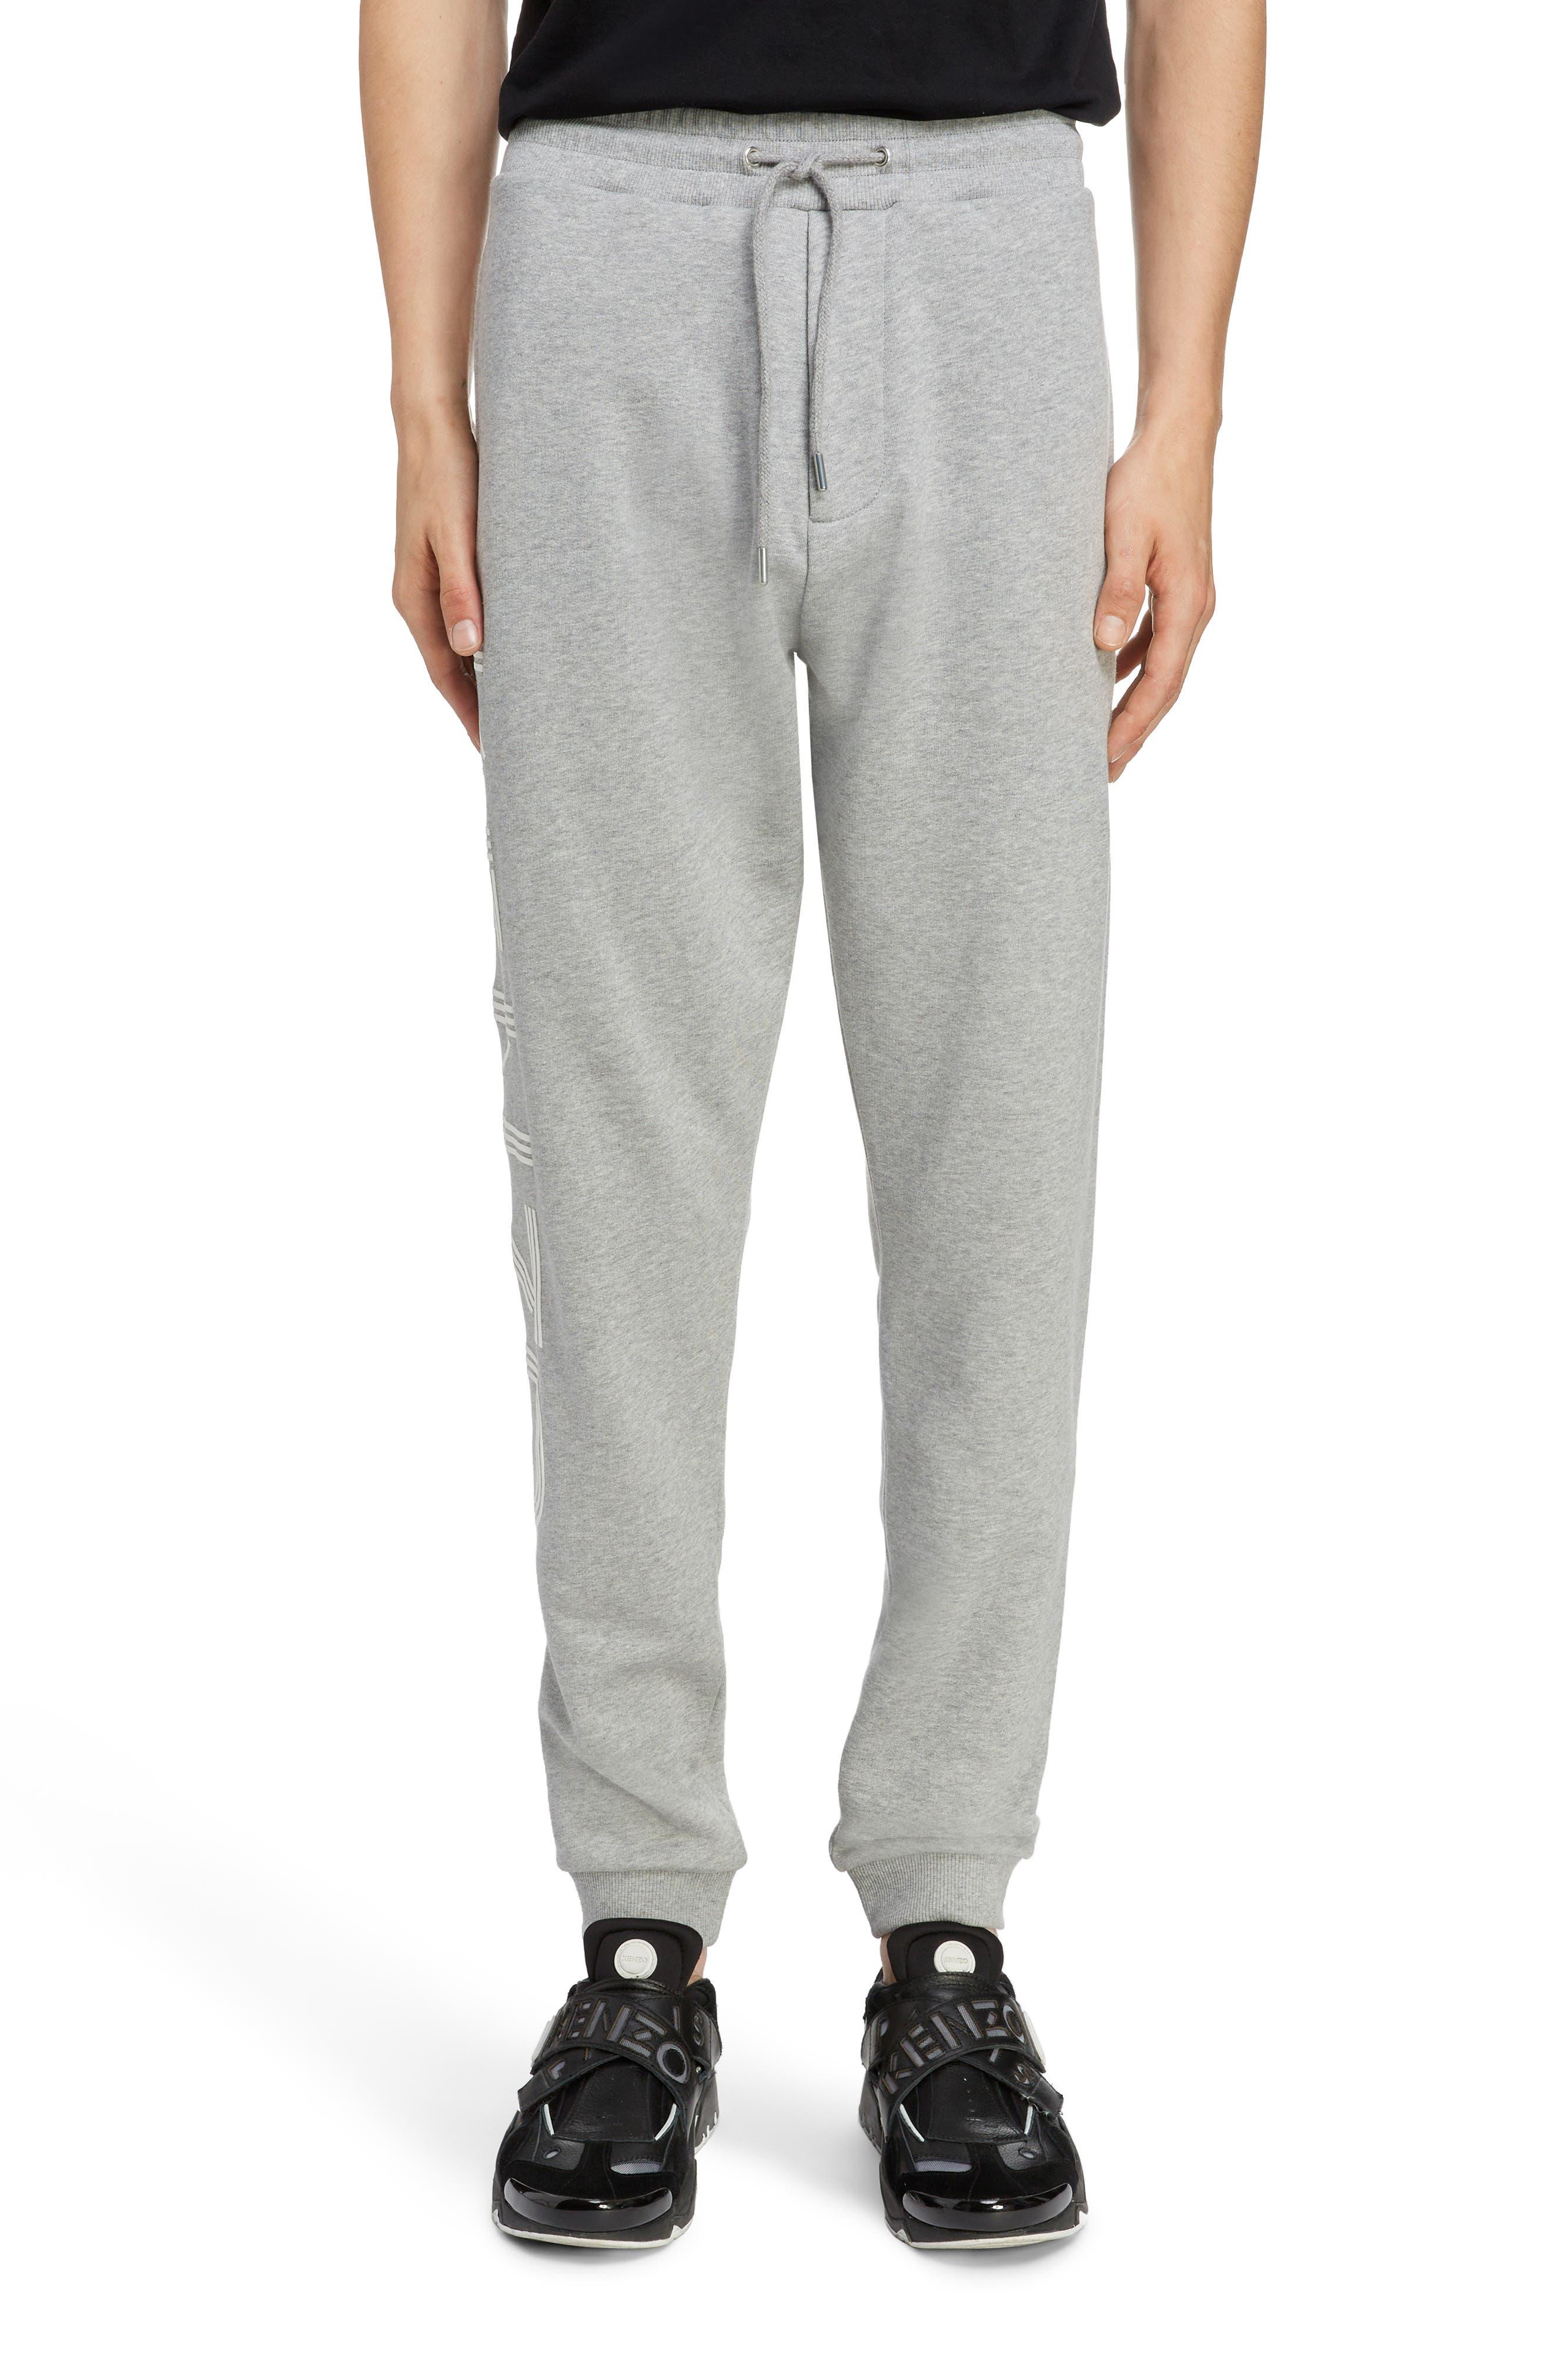 Kenzo Logo Jogger Sweatpants, Grey